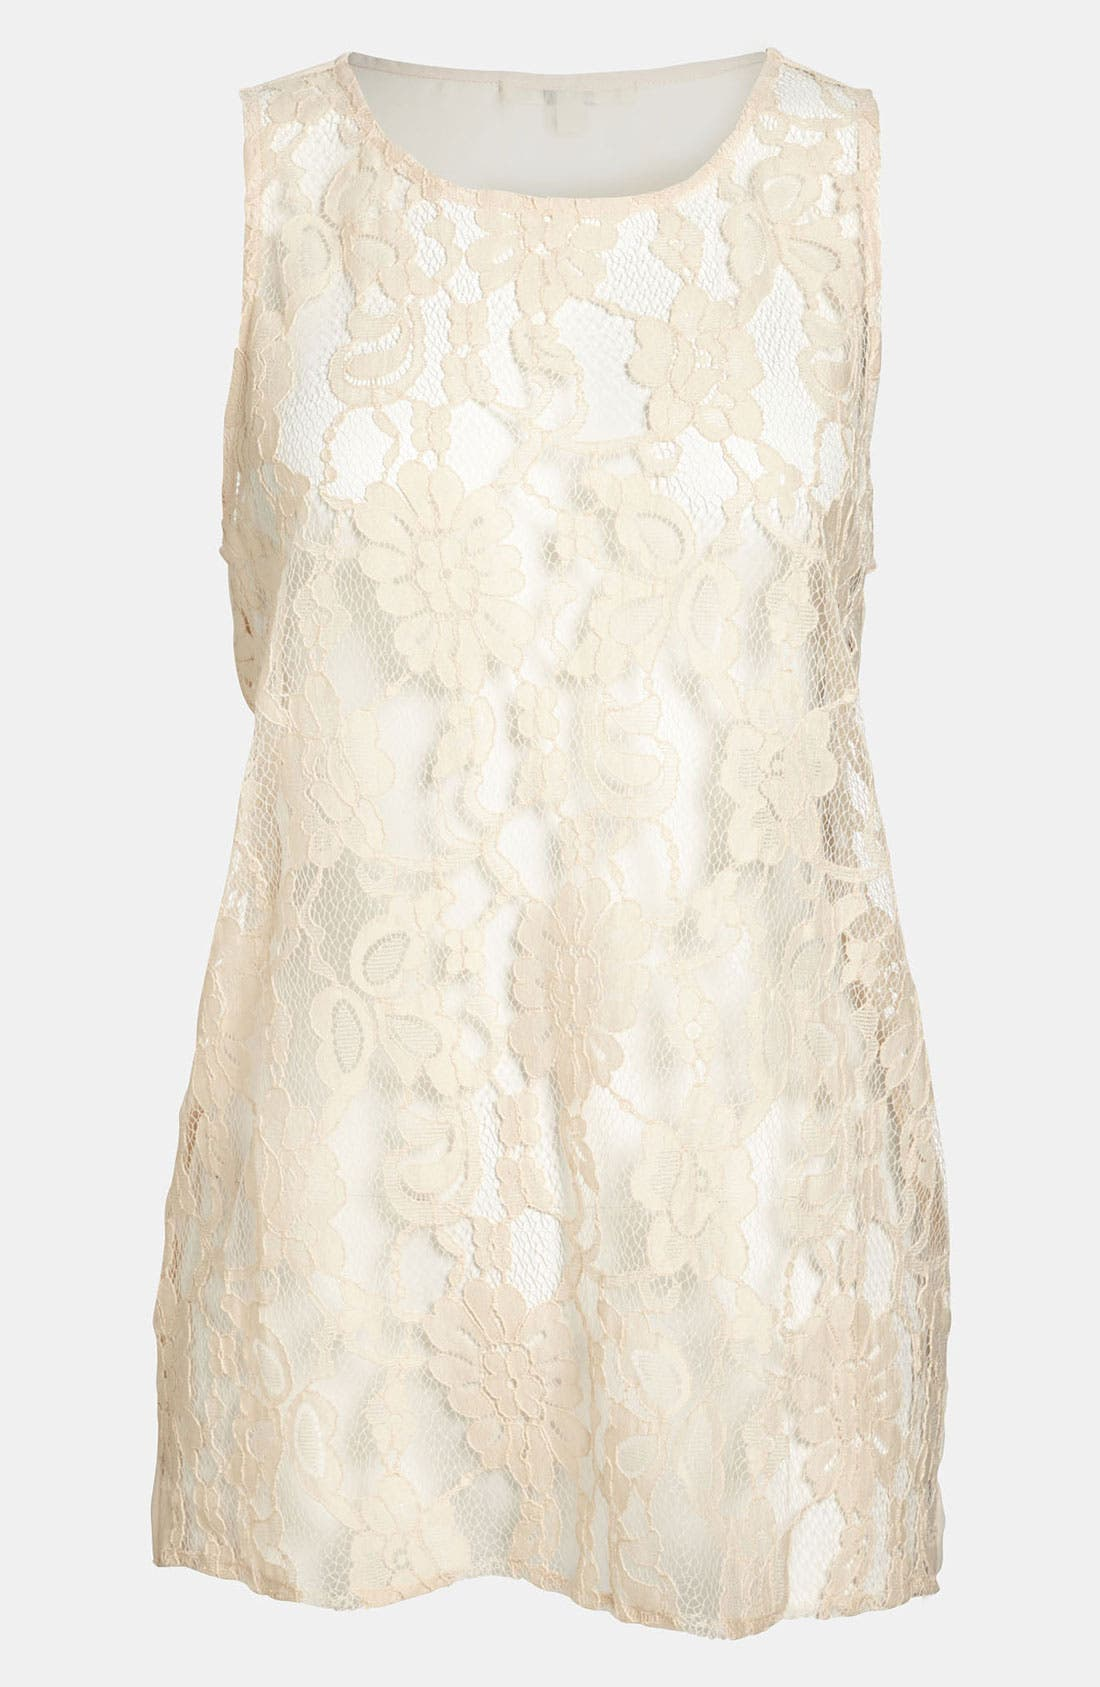 Main Image - BB Dakota Lace Front High/Low Top